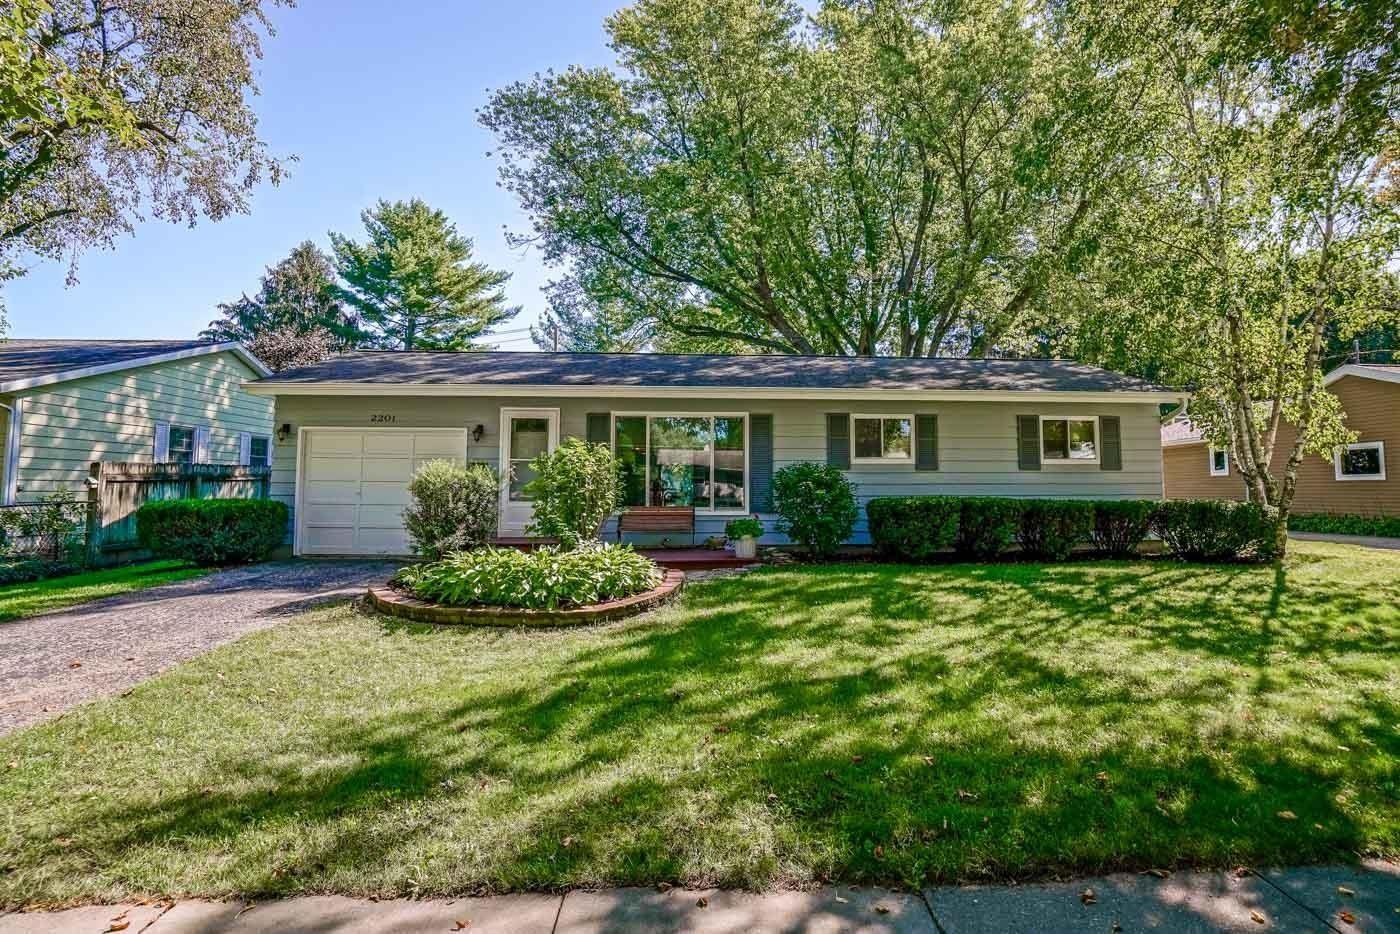 2201 Prairie Rd, Madison, WI 53711 - #: 1919945